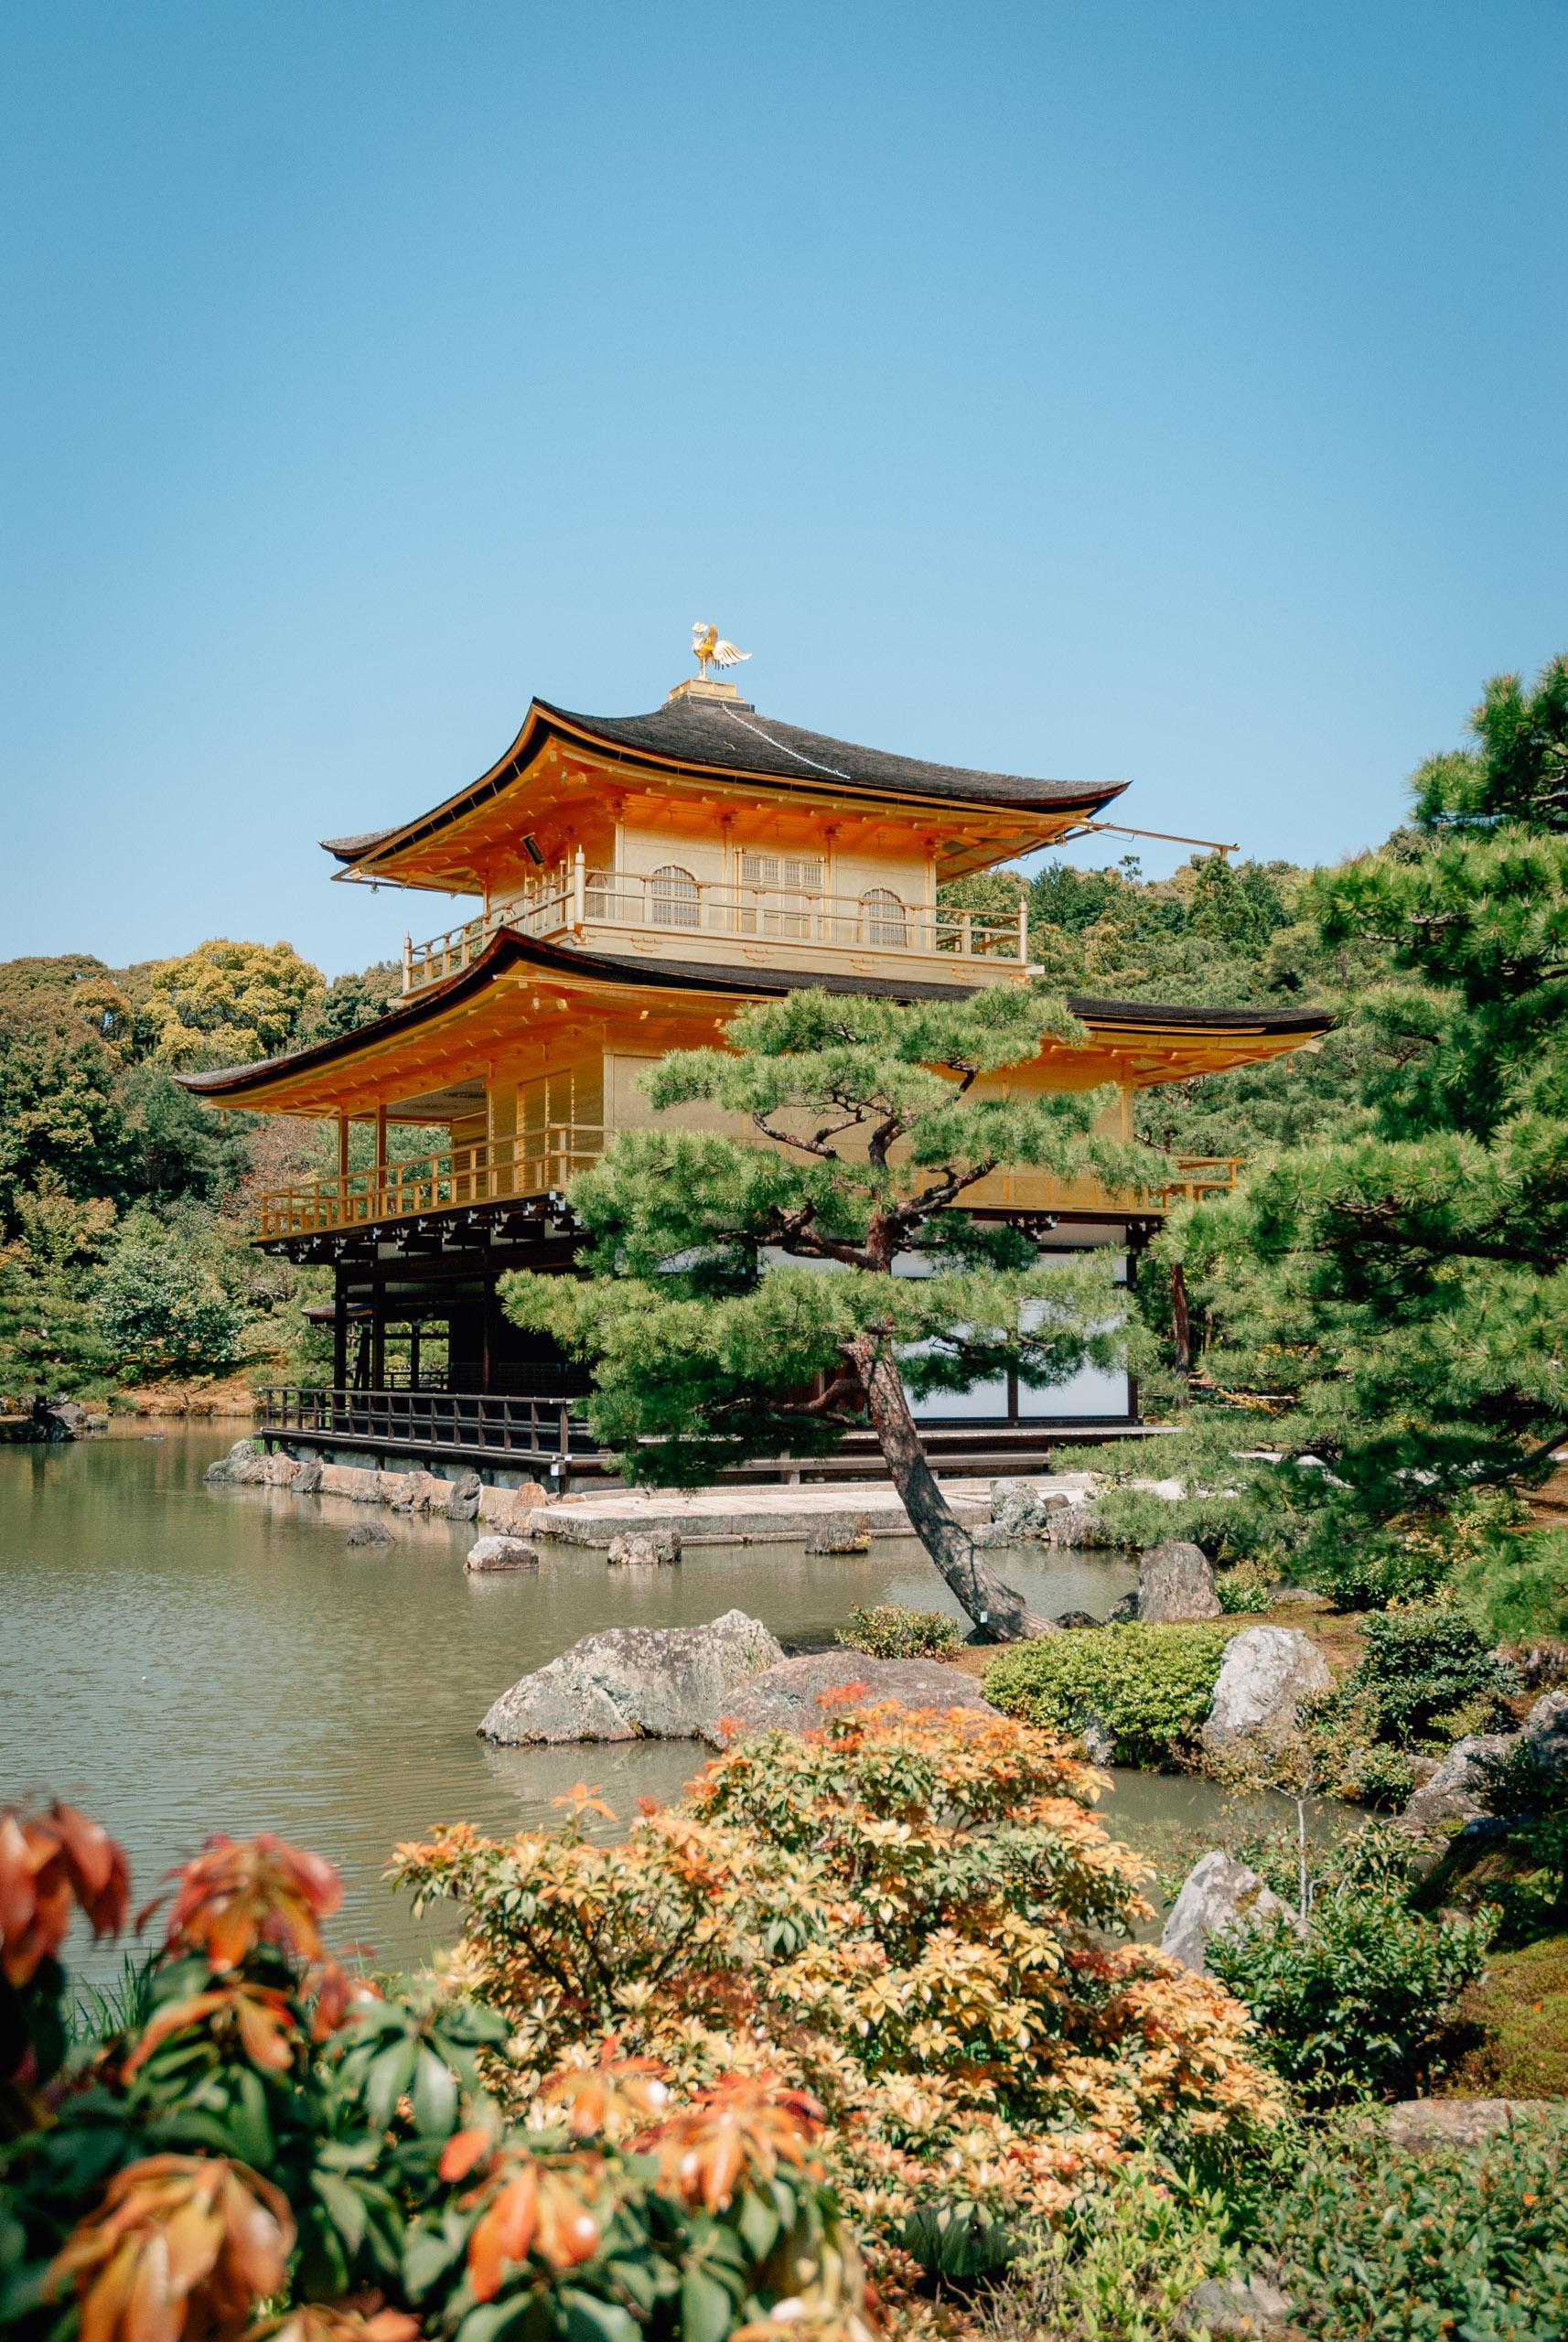 Japan - Tokyo Kyoto & Nikko - 2010-0427-DSC_0128_55932